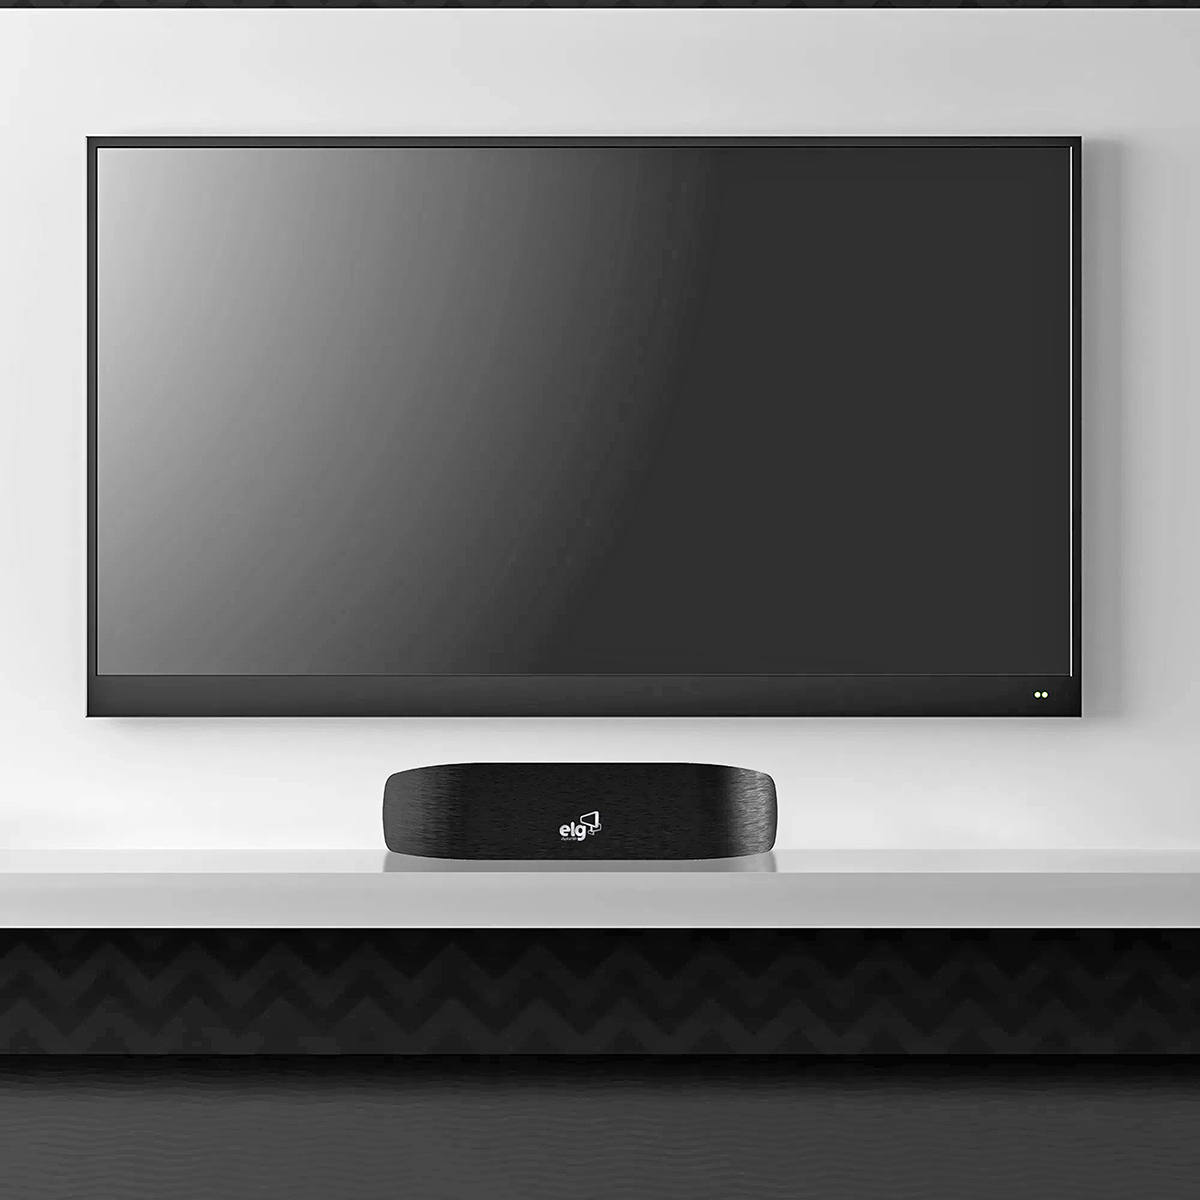 Antena Digital 4K HDR HDTV UHF VHF Interna Alcance 40Km Recepção Omnidirecional Alta Definição Cabo 2,5m ELG HDTV4500BK